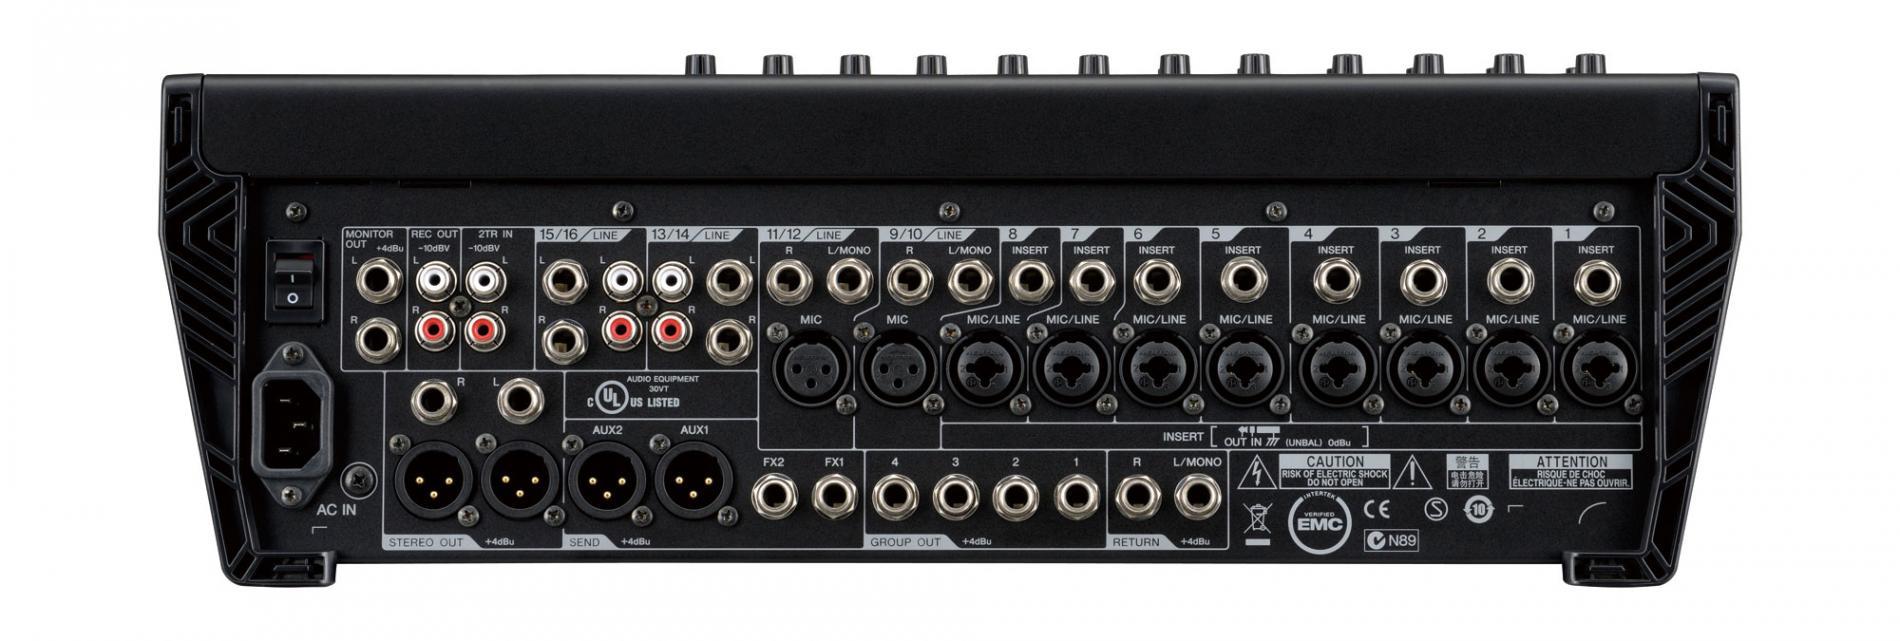 MW-1608 Hybrid-Mixer B-Ware